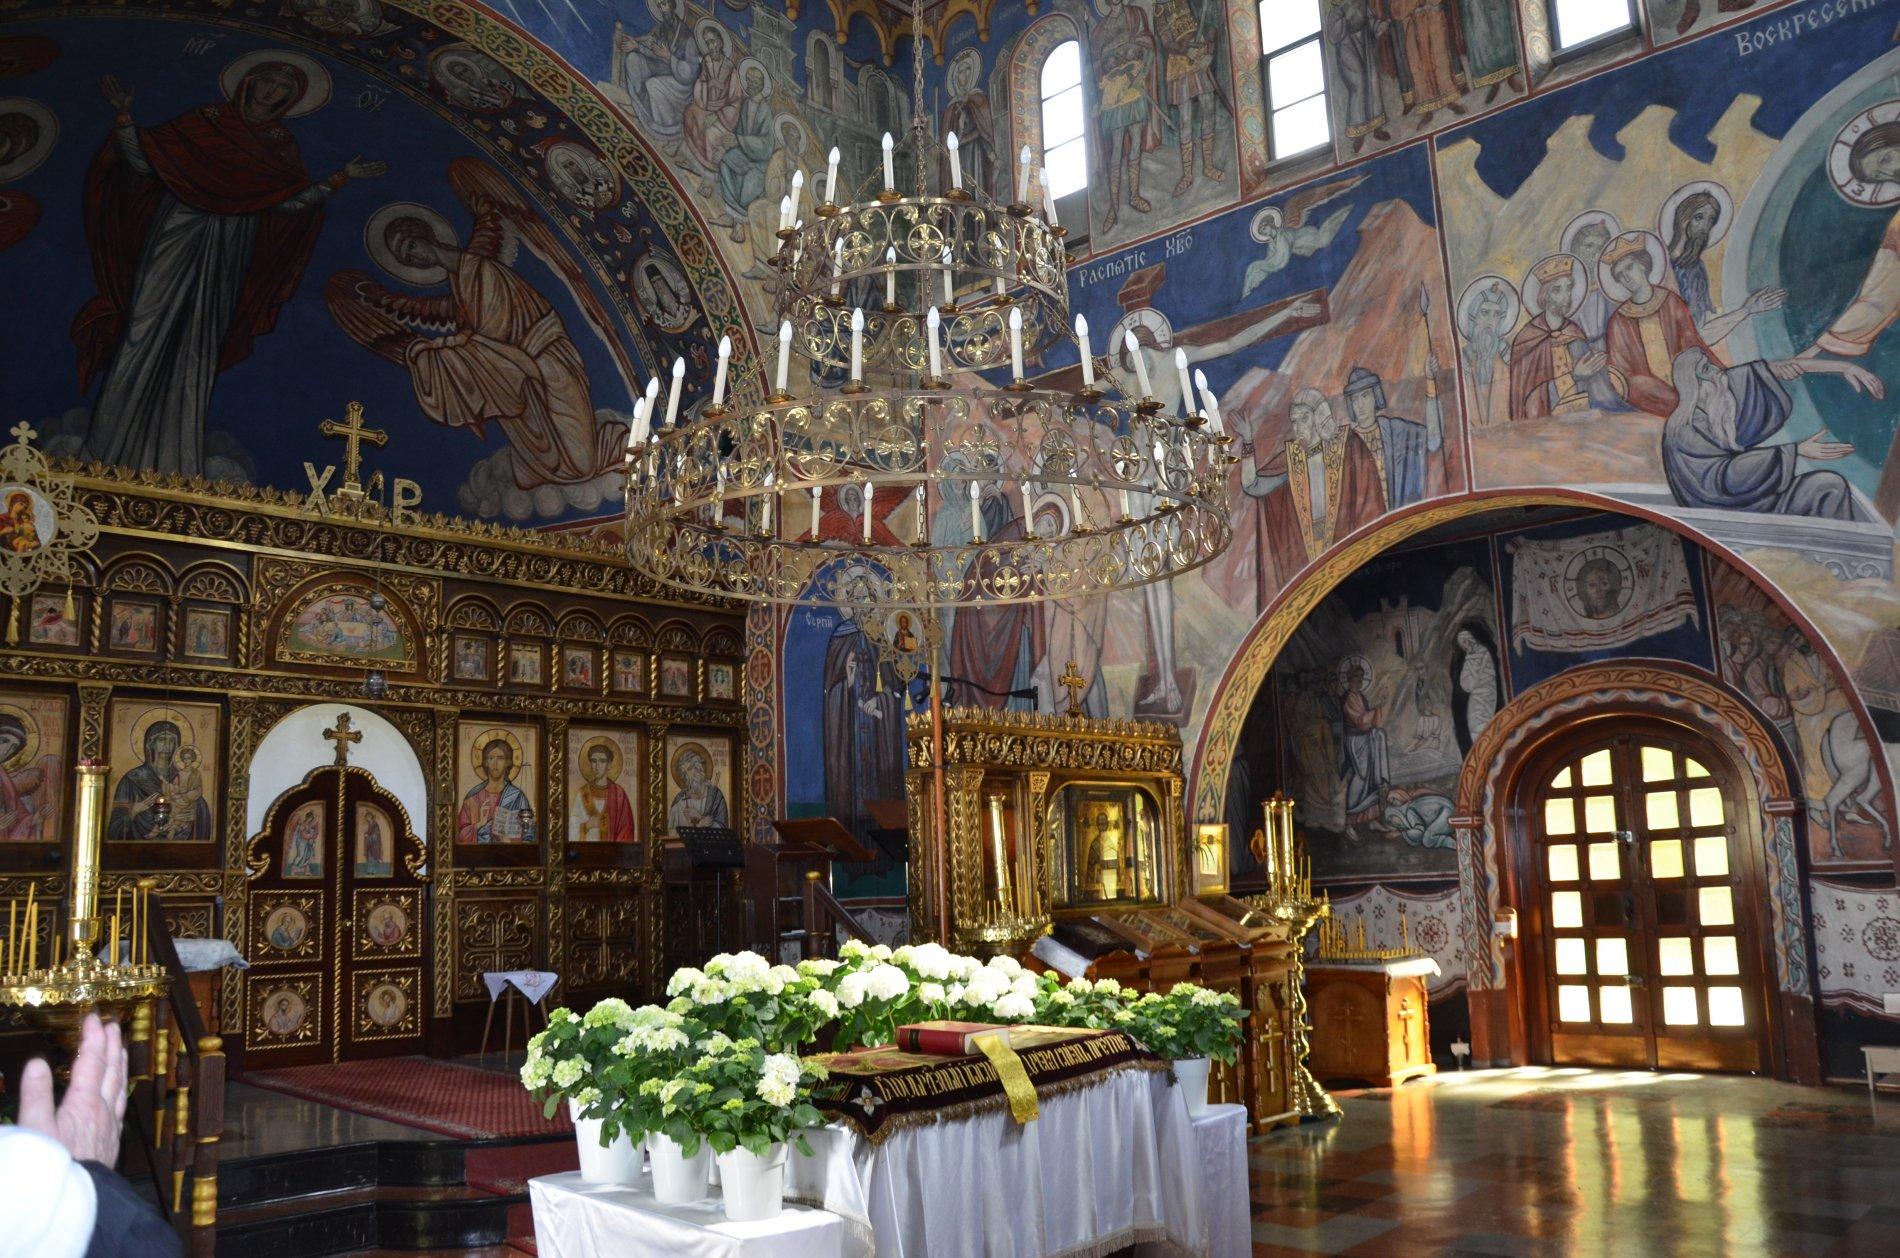 Russisch Orthodoxe Kirche Seitenausgang - Ostern in der russisch-orthodoxen Kirche findet zeitversetzt zu unserem Osterfest statt